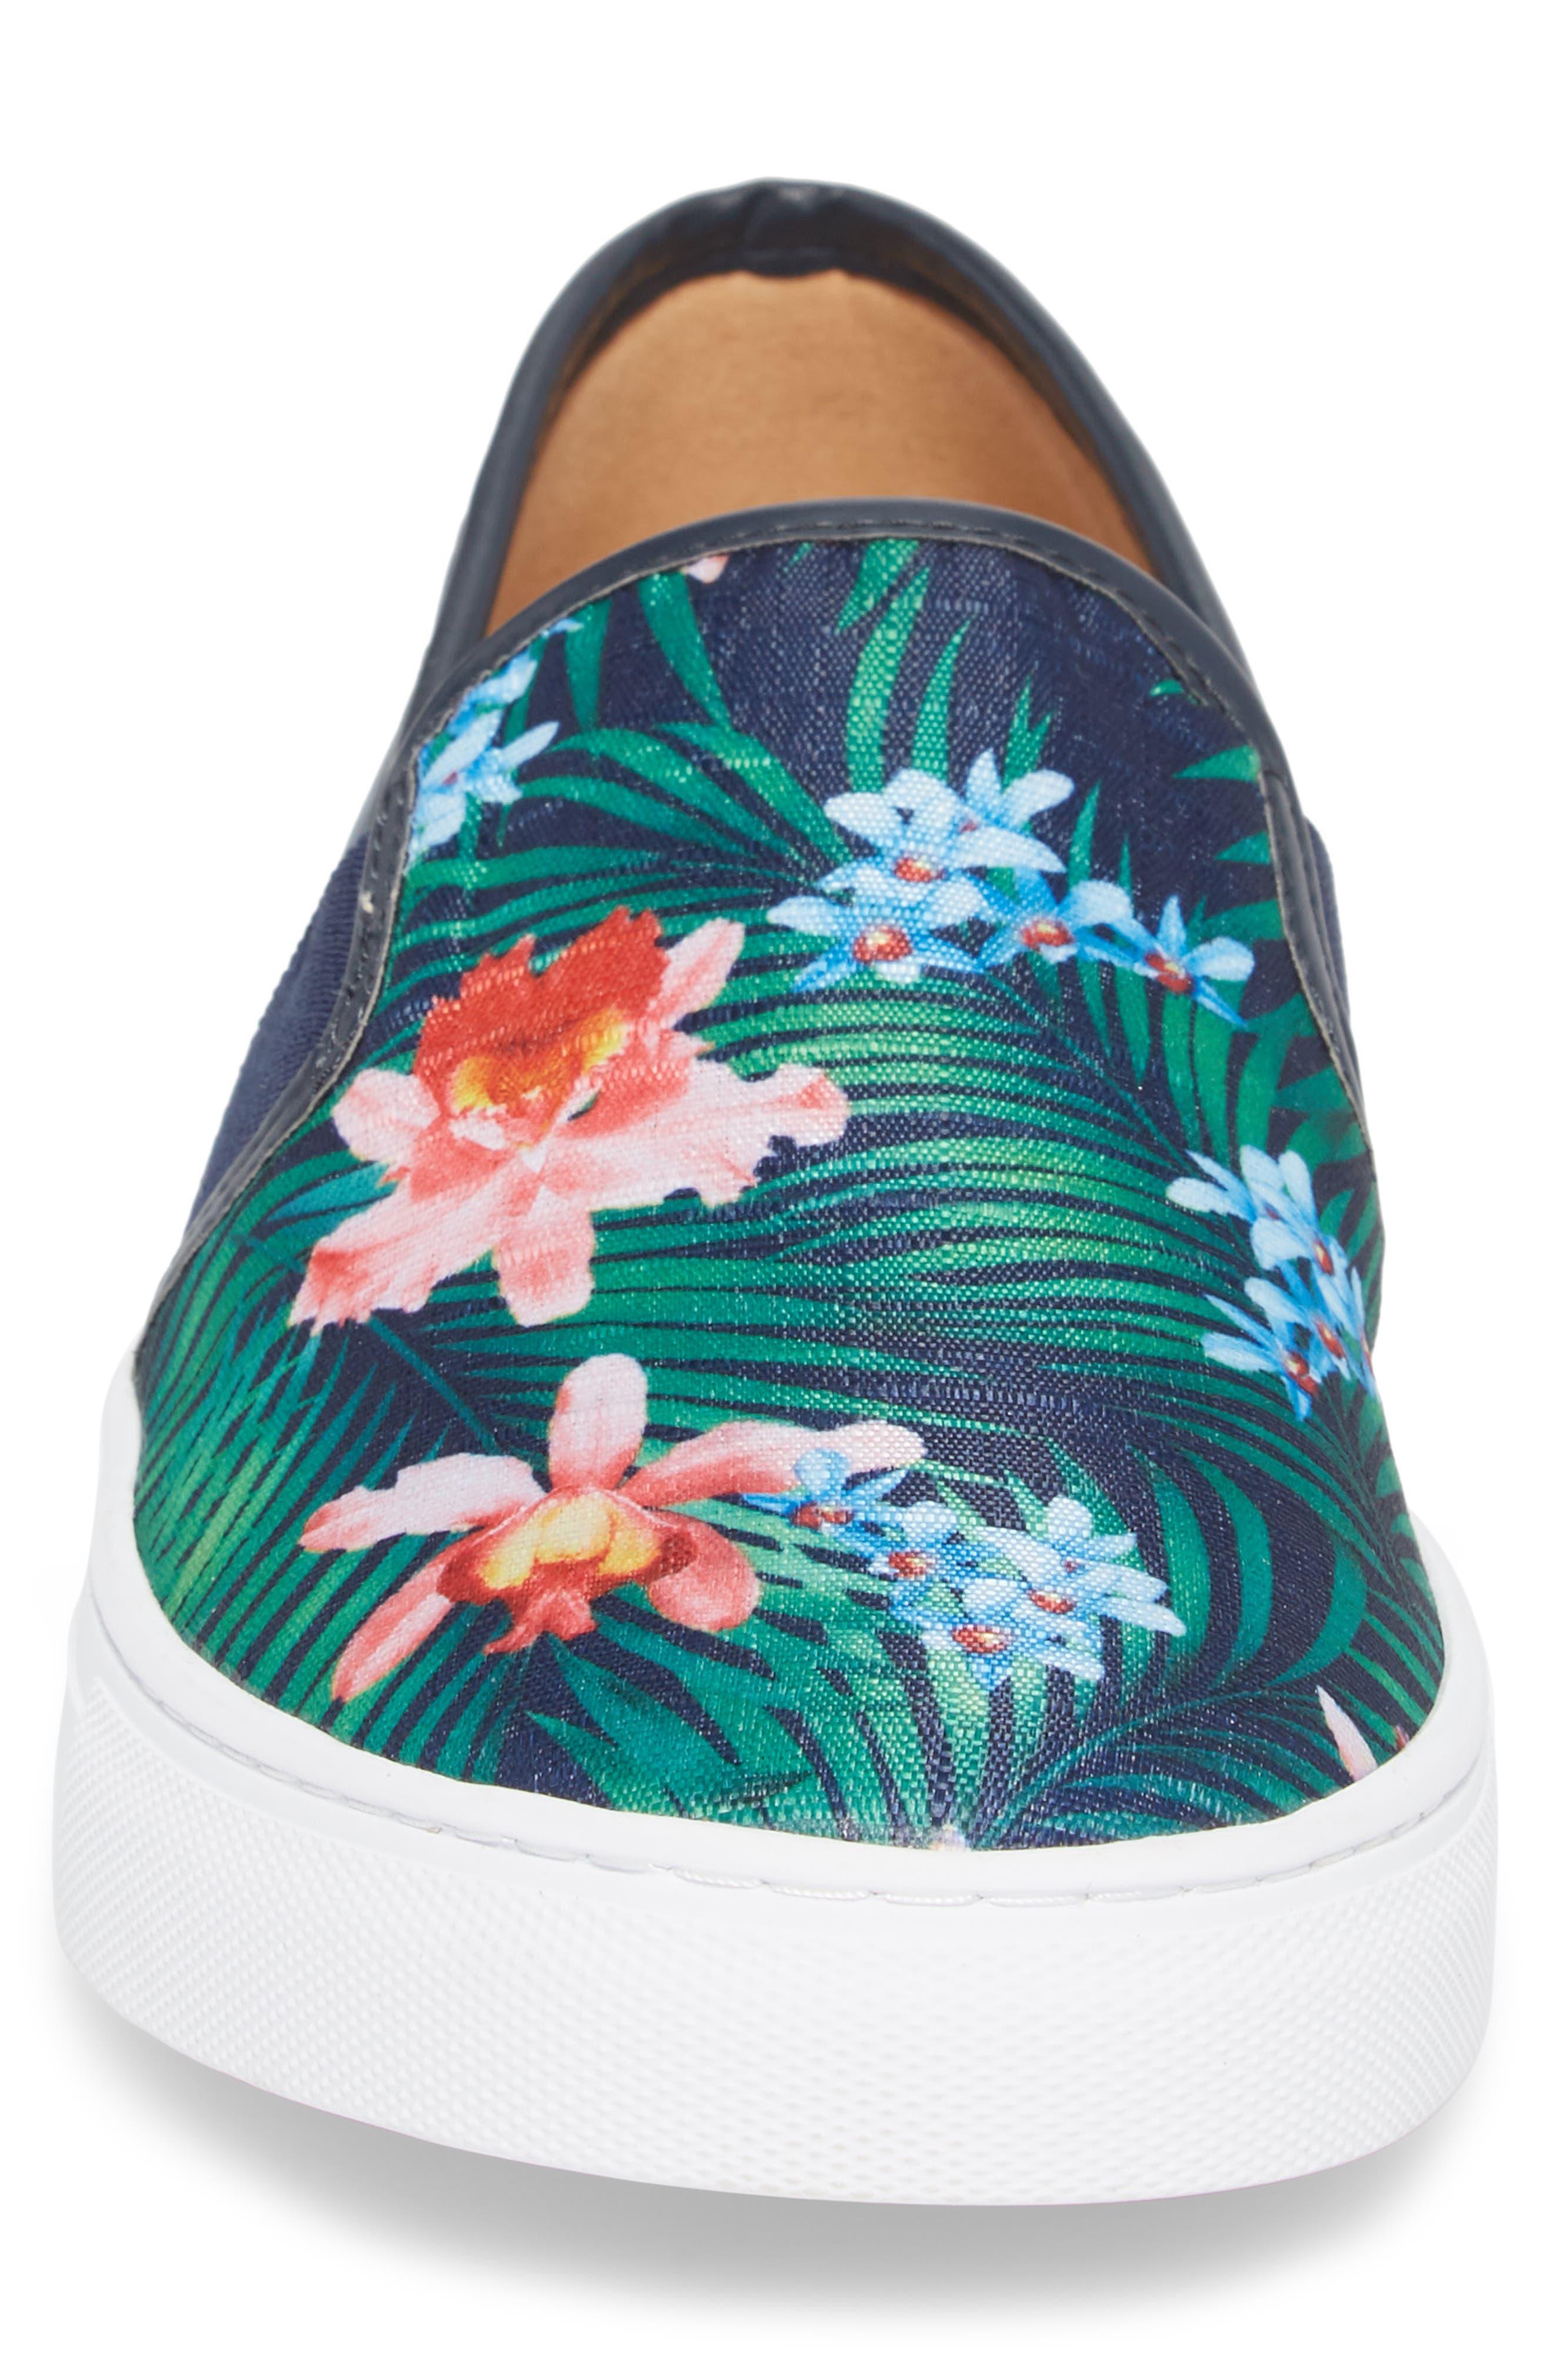 Fish 'N' Chips Bali Slip-On Sneaker,                             Alternate thumbnail 4, color,                             Navy Multi Fabric